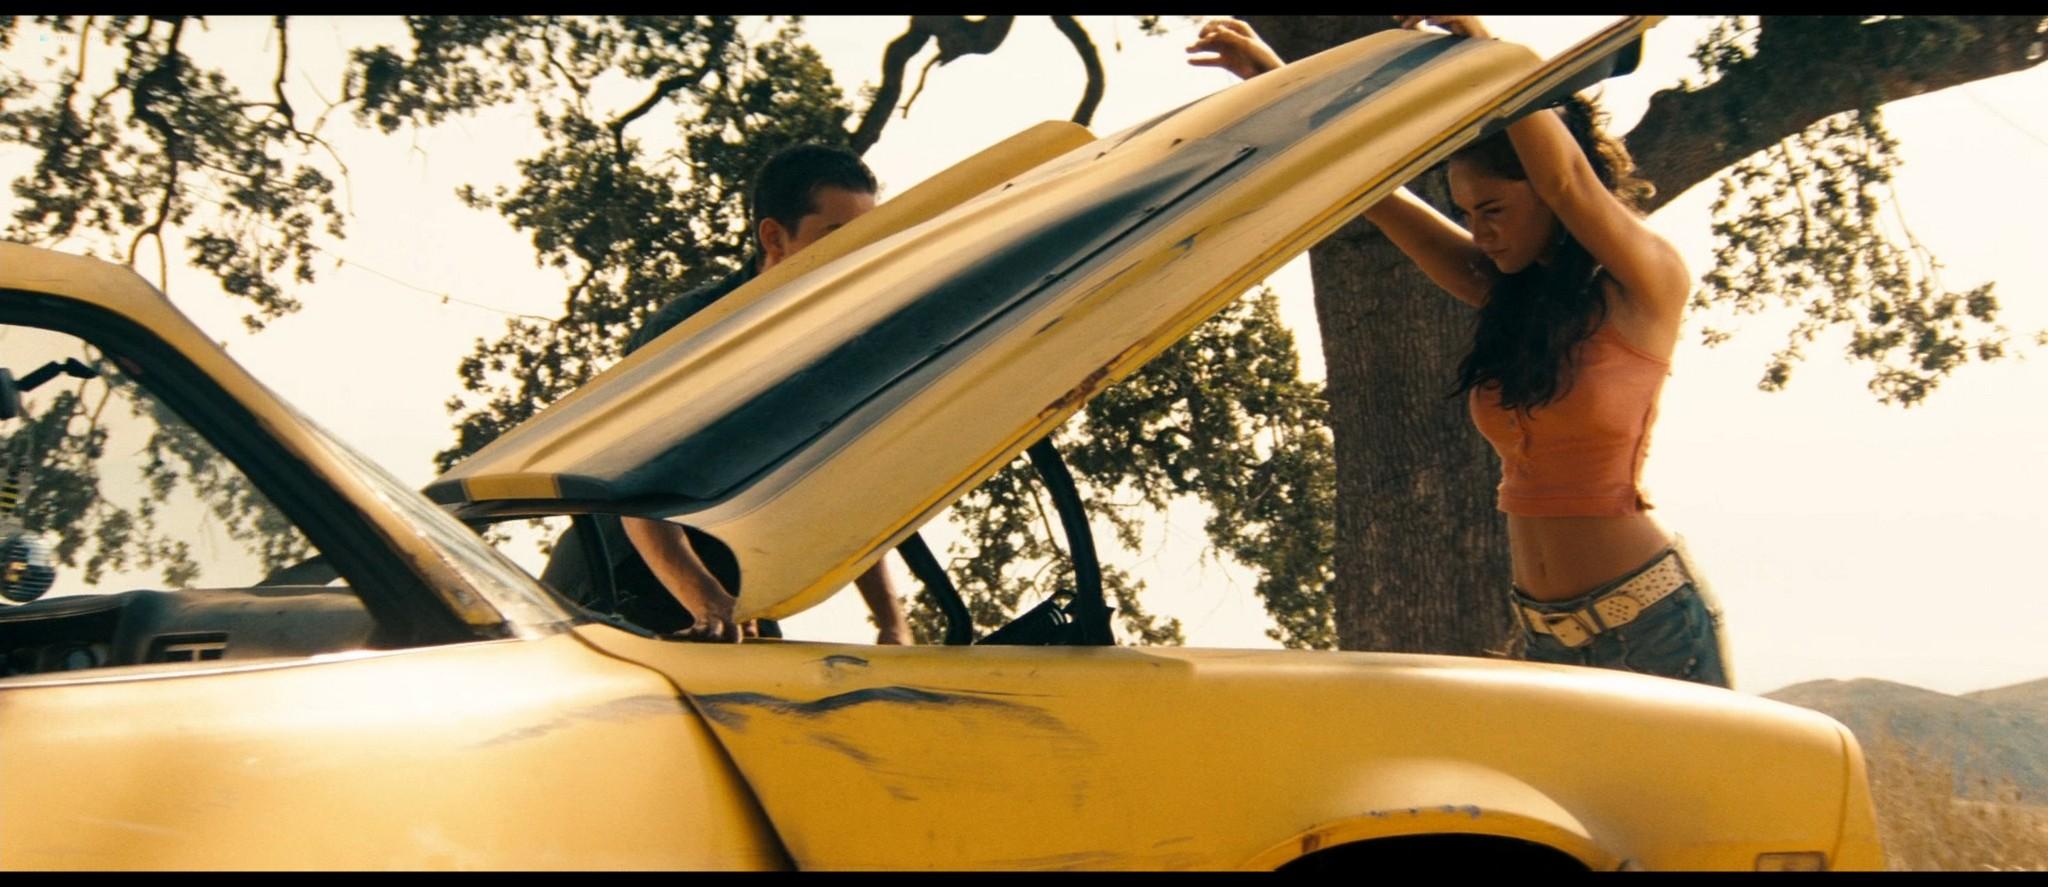 Megan Fox hot and sexy - Transformers (2007) HD 1080p BluRay Remux (17)